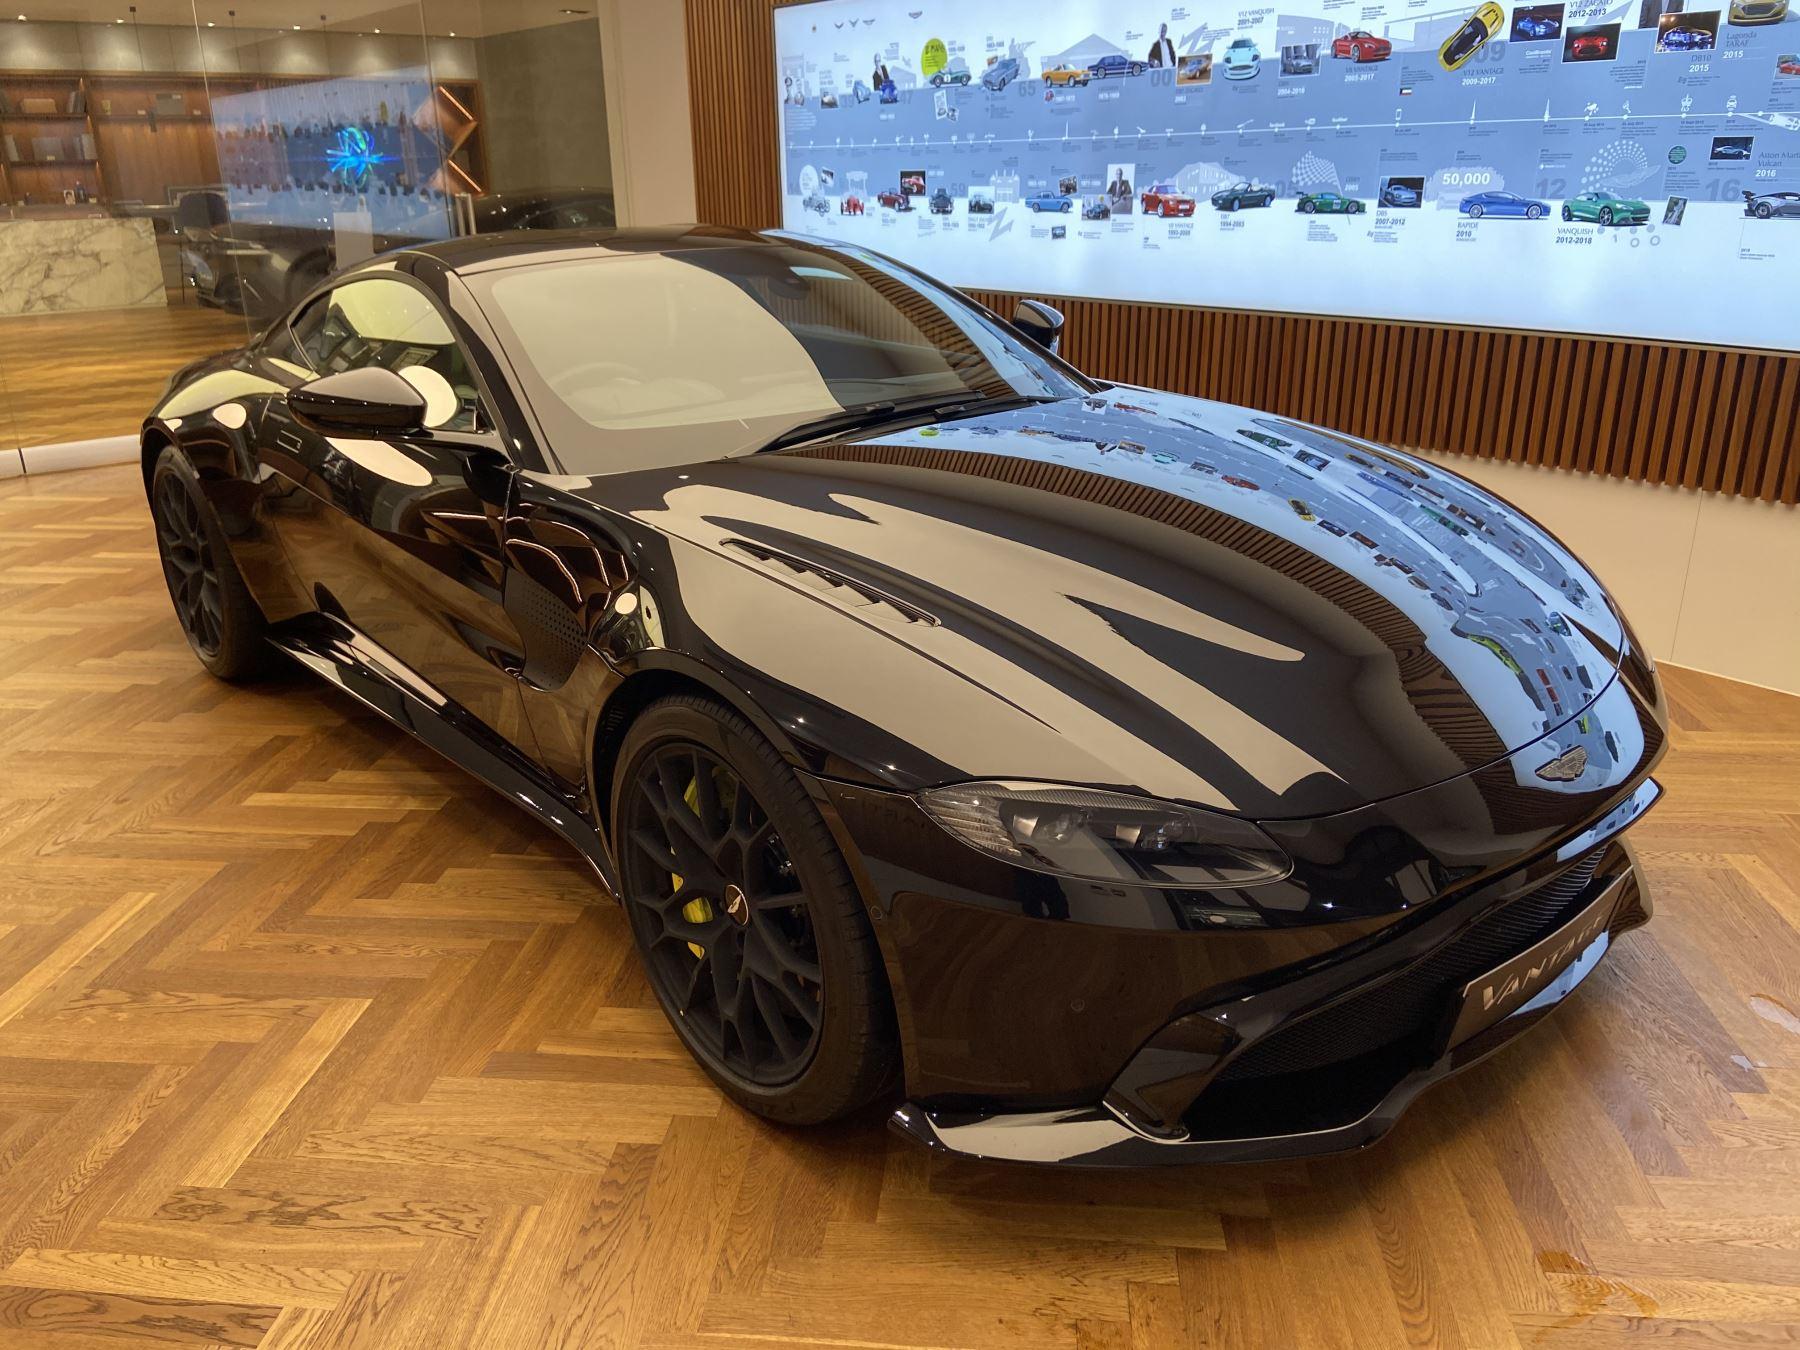 Aston Martin New Vantage AMR Hero Edition  image 4